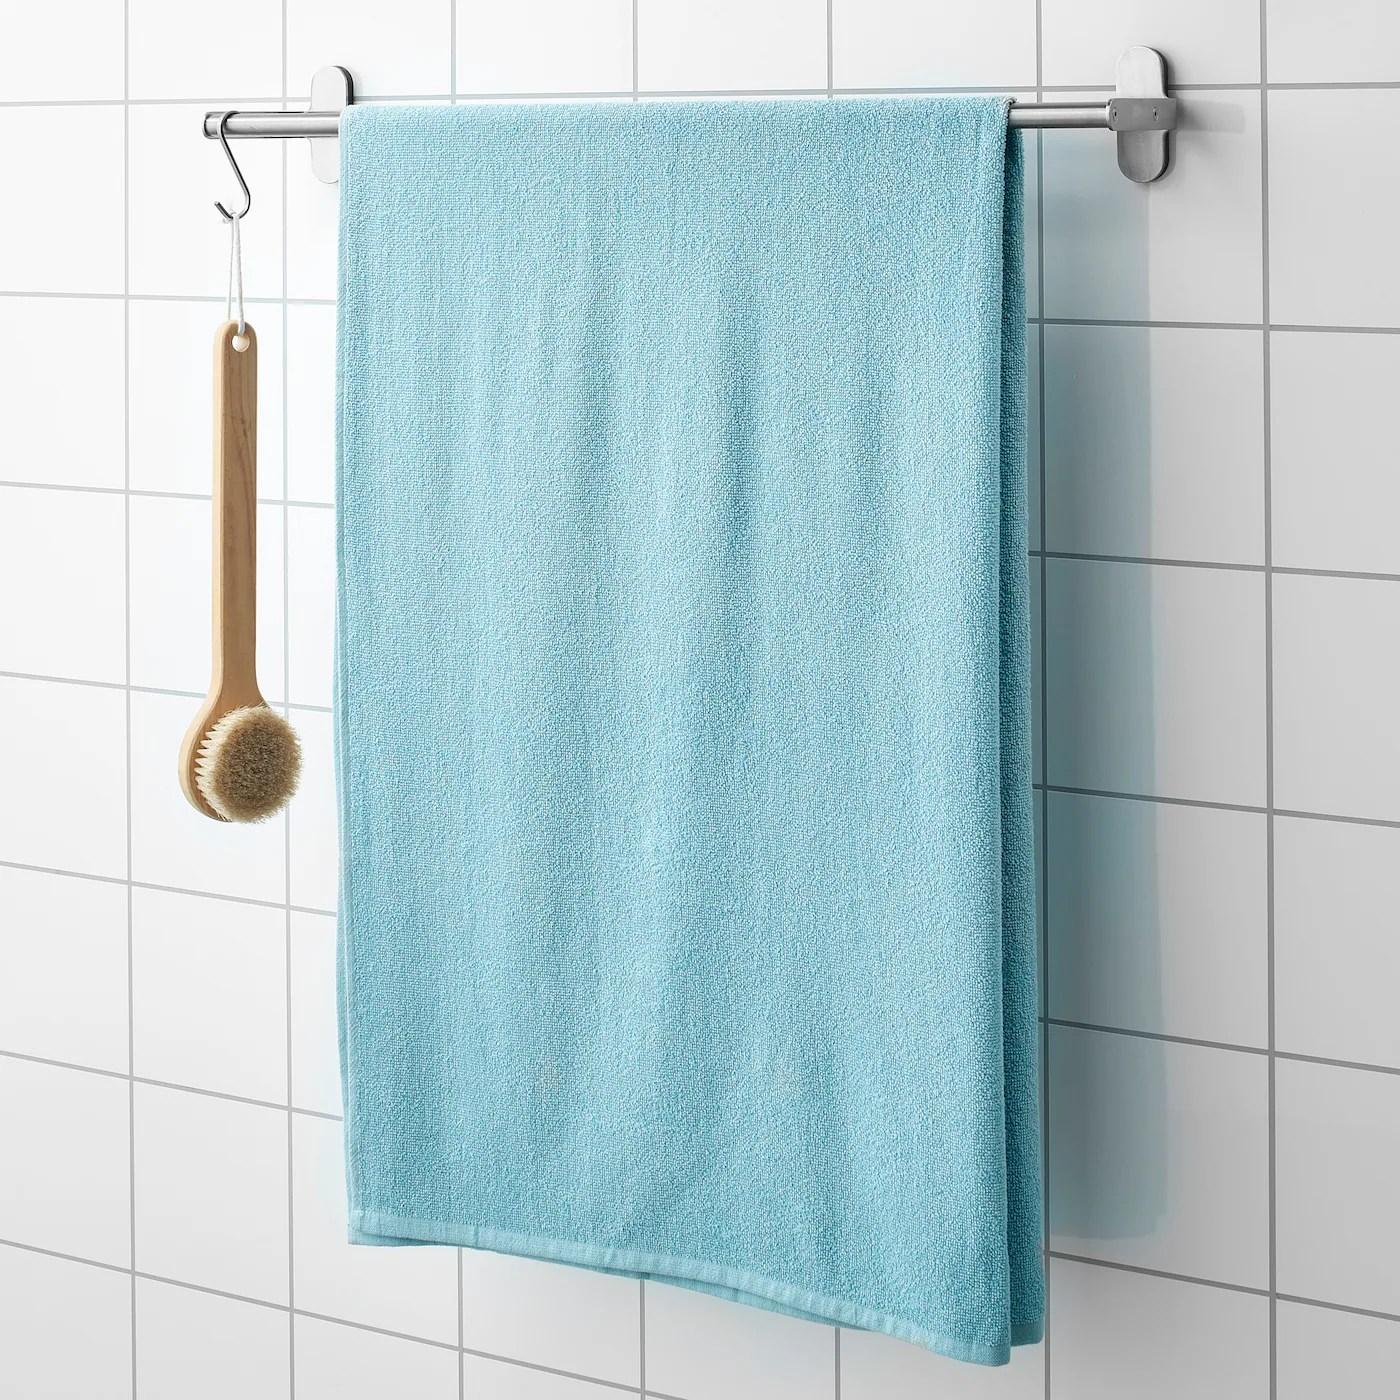 Kornan Drap De Bain Bleu Clair 100x150 Cm Ikea Suisse